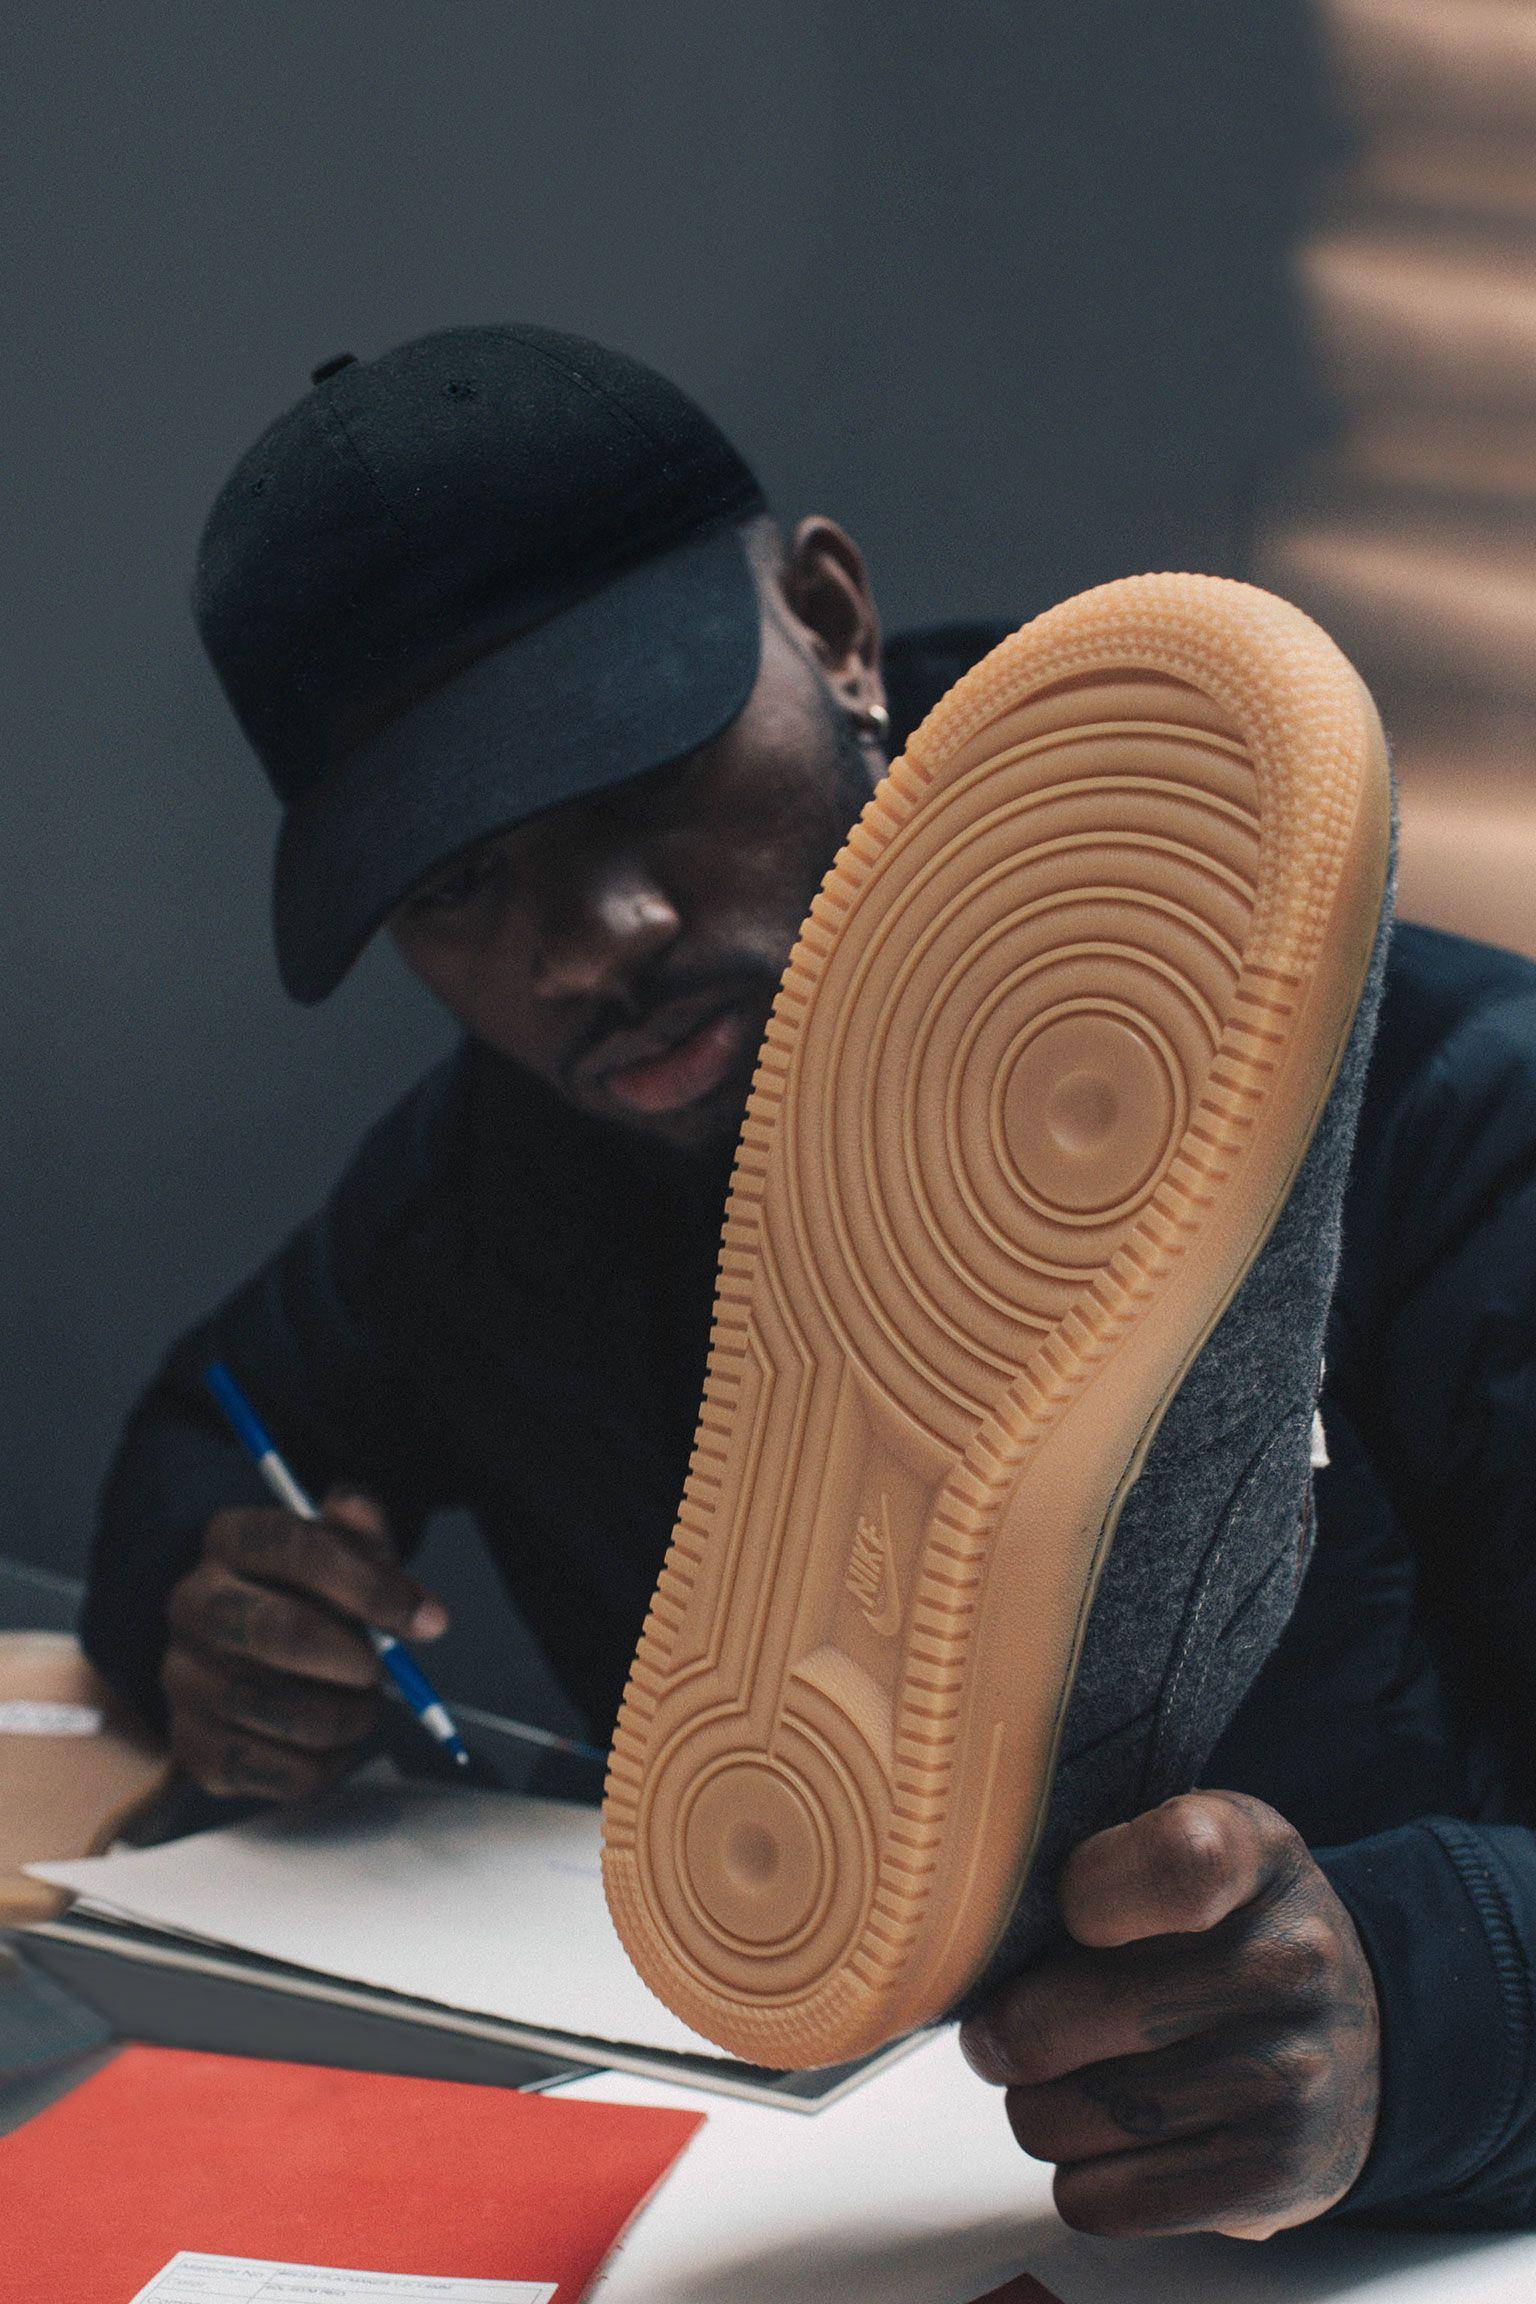 Bryson Behind Design The Snkrs Tiller Nike wZRgqZ